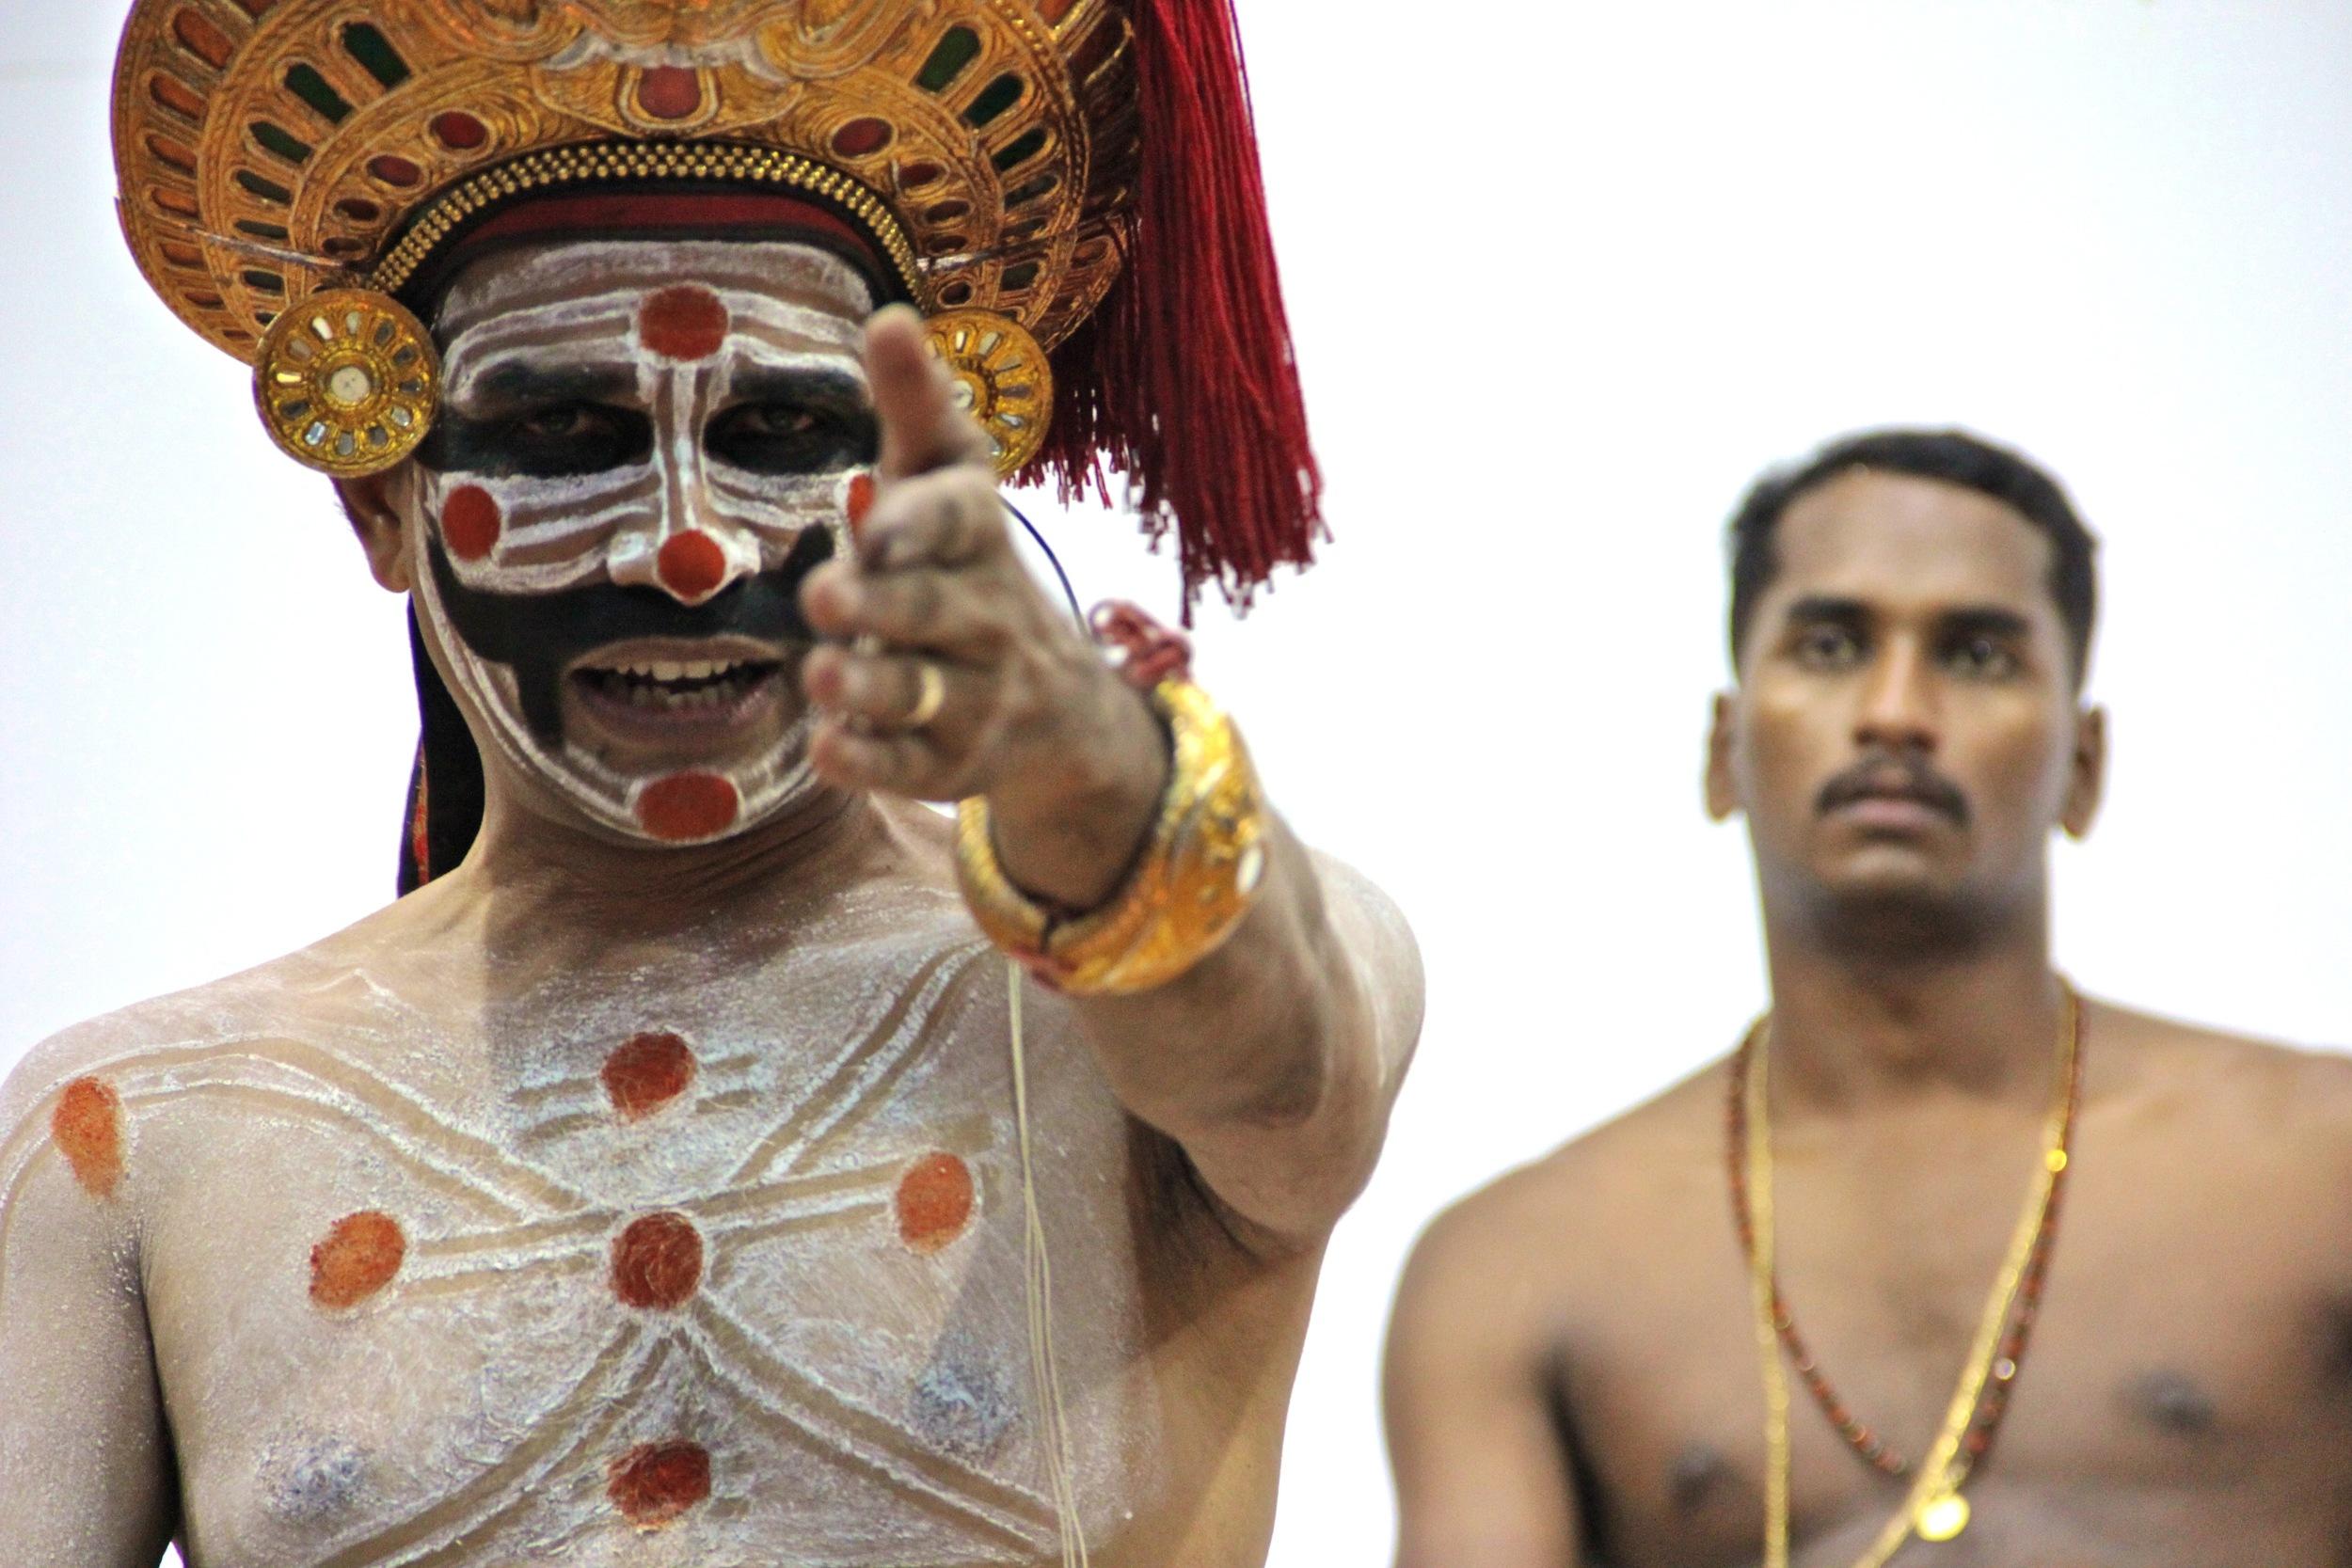 Painkulam Narayanan Chakiar and Jeyaraja (R) enacting the story of Princess Pancali in Calicut, India, Dec. 23, 2011.